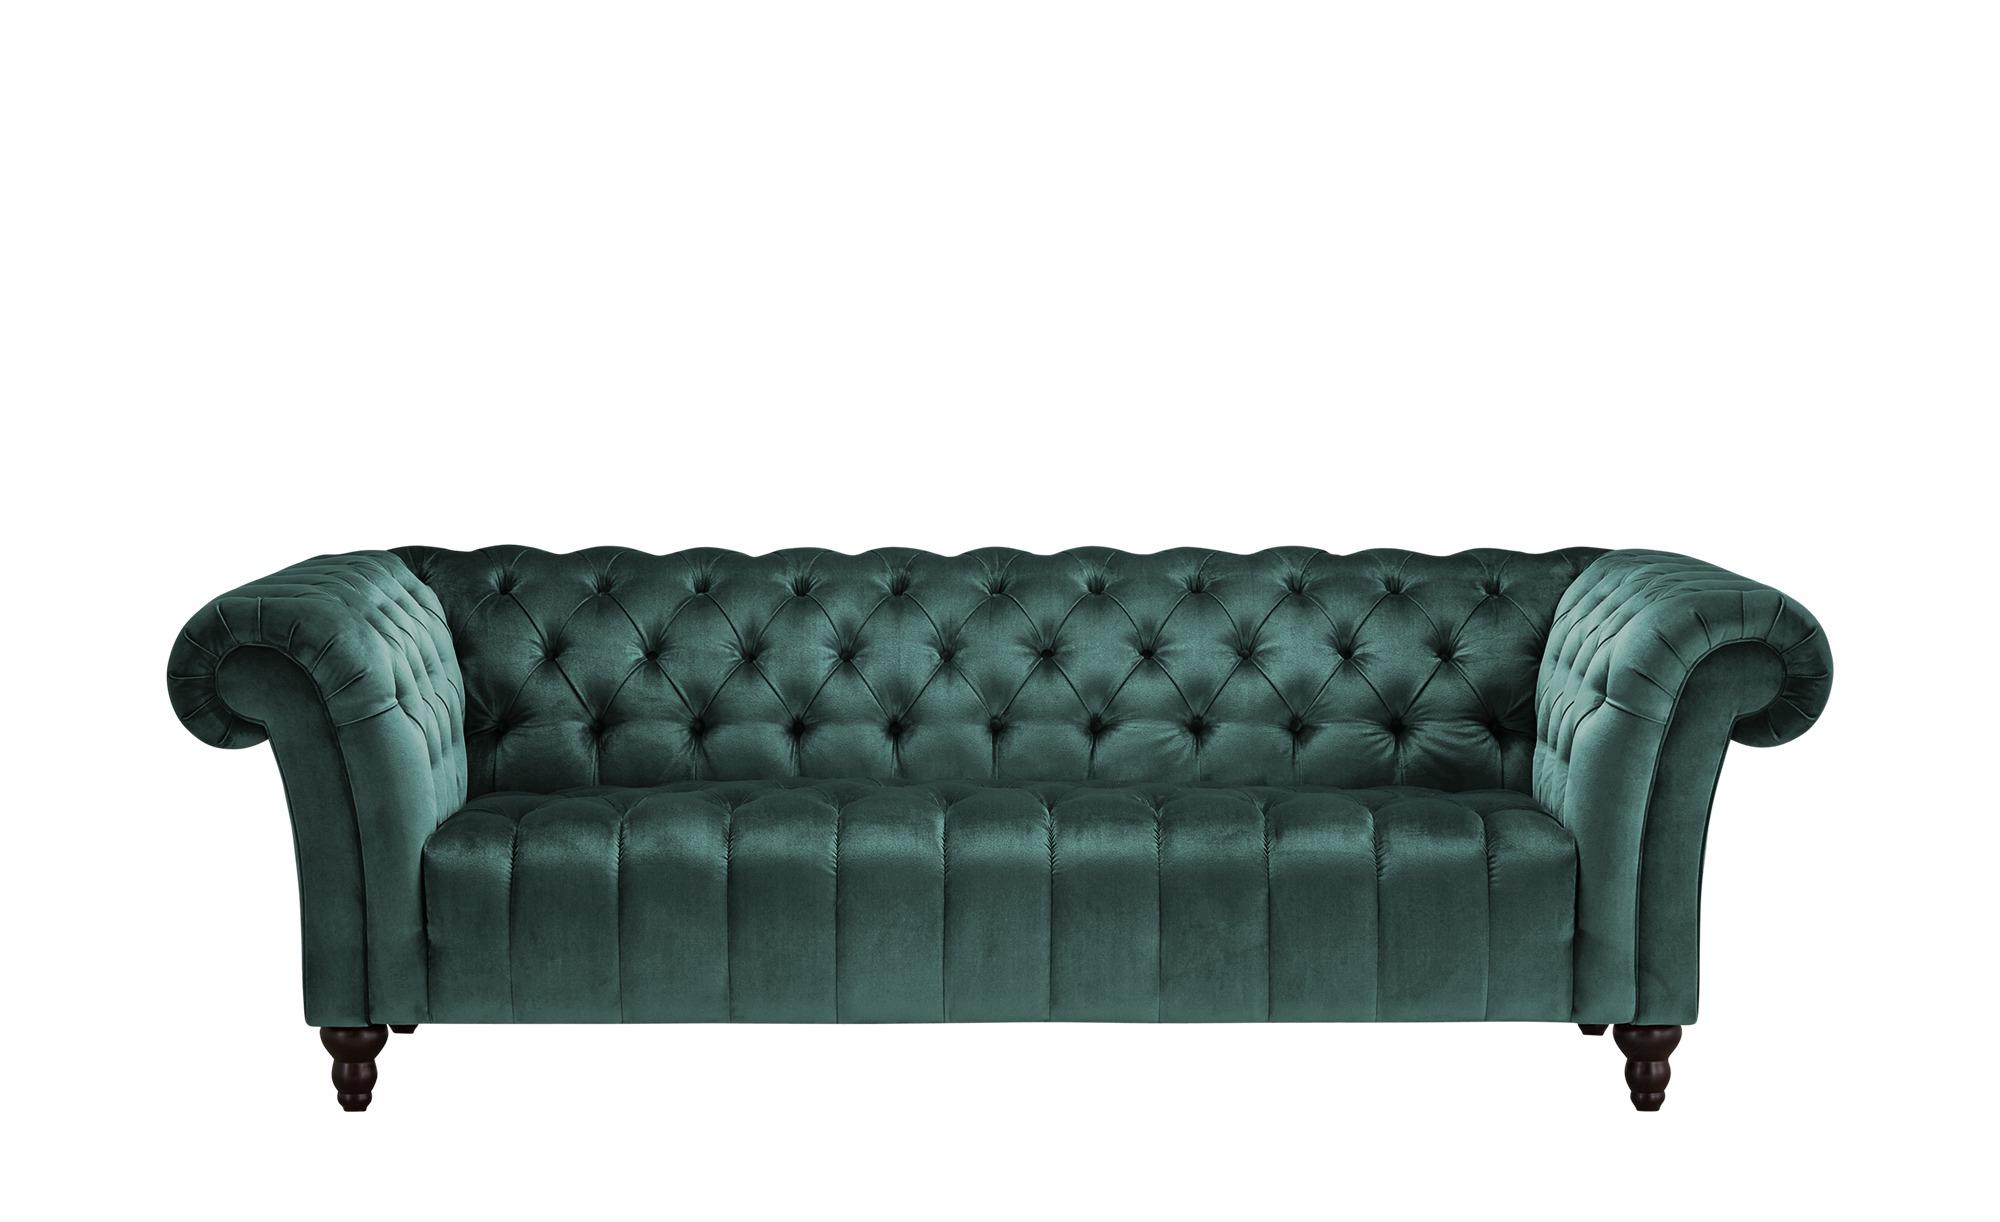 Big Sofa  Canyon ¦ grün ¦ Maße (cm): B: 230 H: 74 T: 101 Polstermöbel > Sofas > Big-Sofas - Höffner